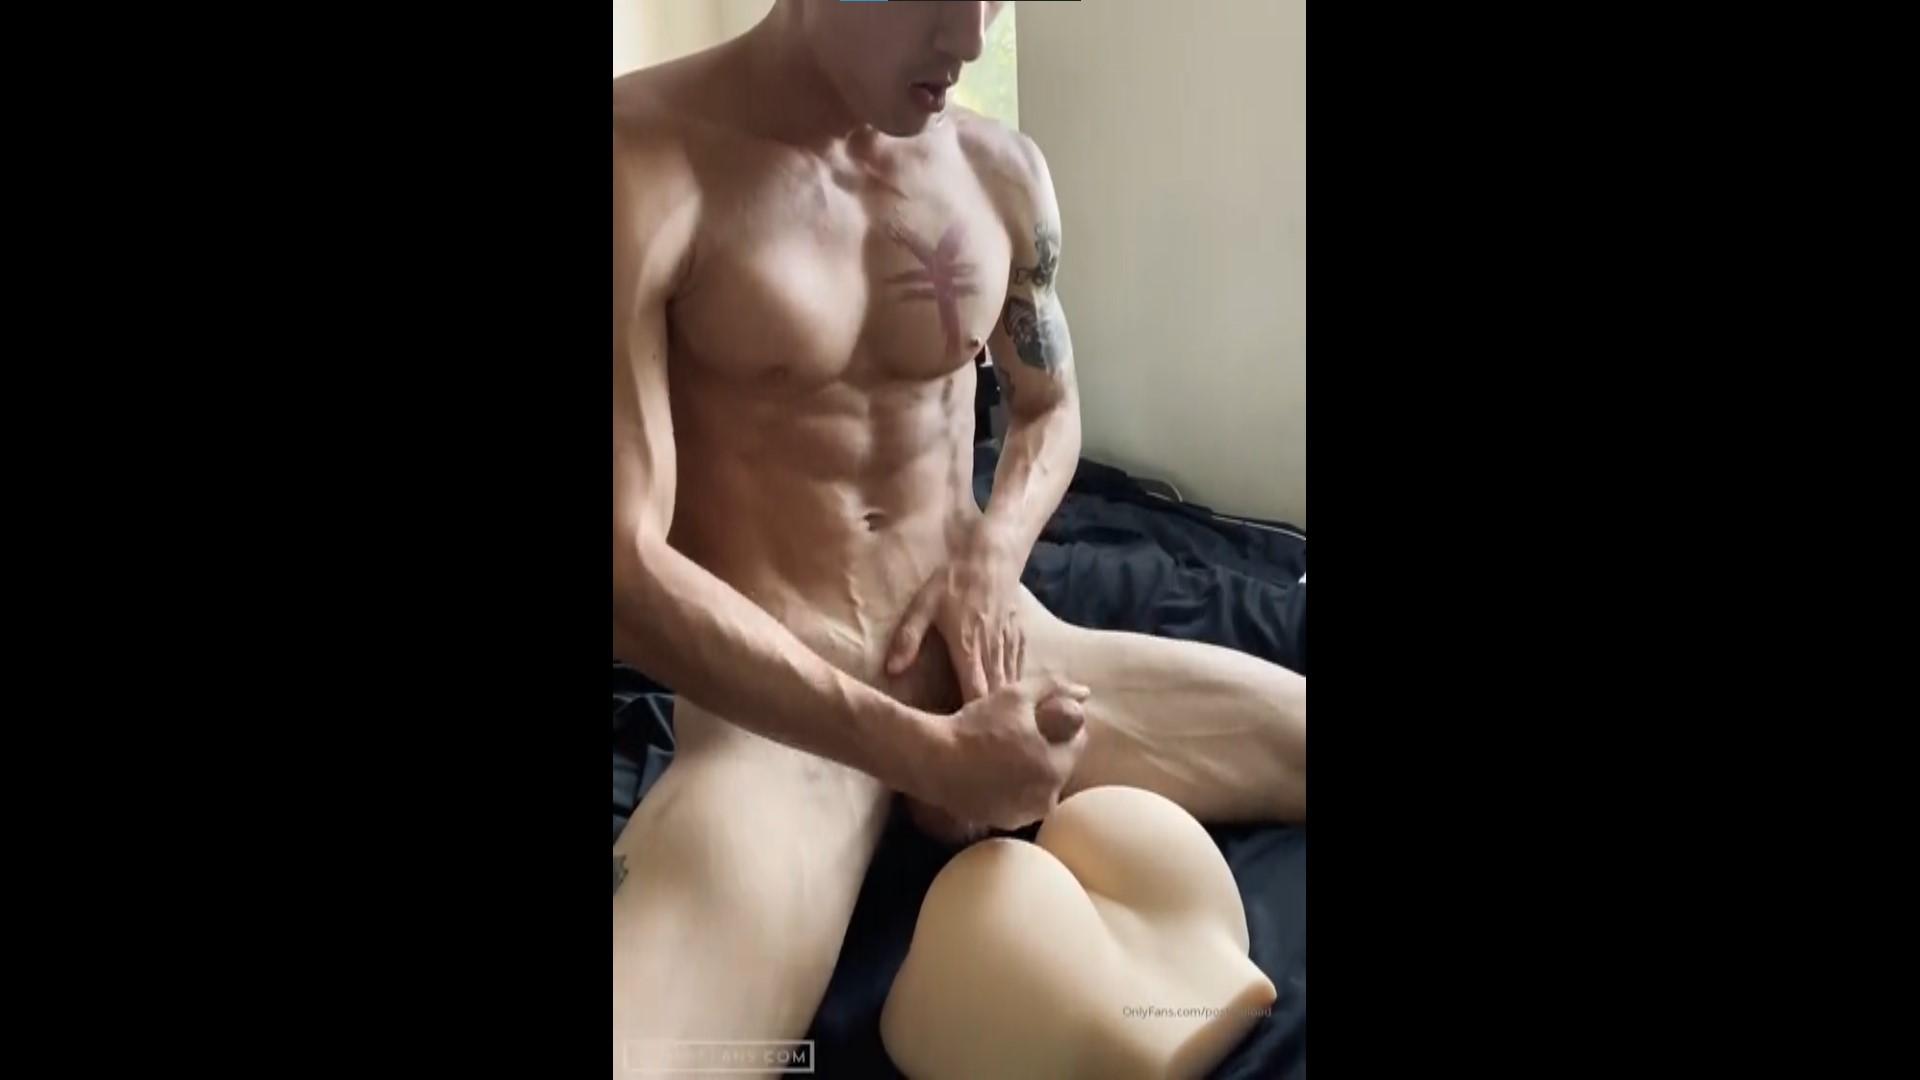 Fucking my sex toy and cumming over it - Cody Seiya (postmaload)